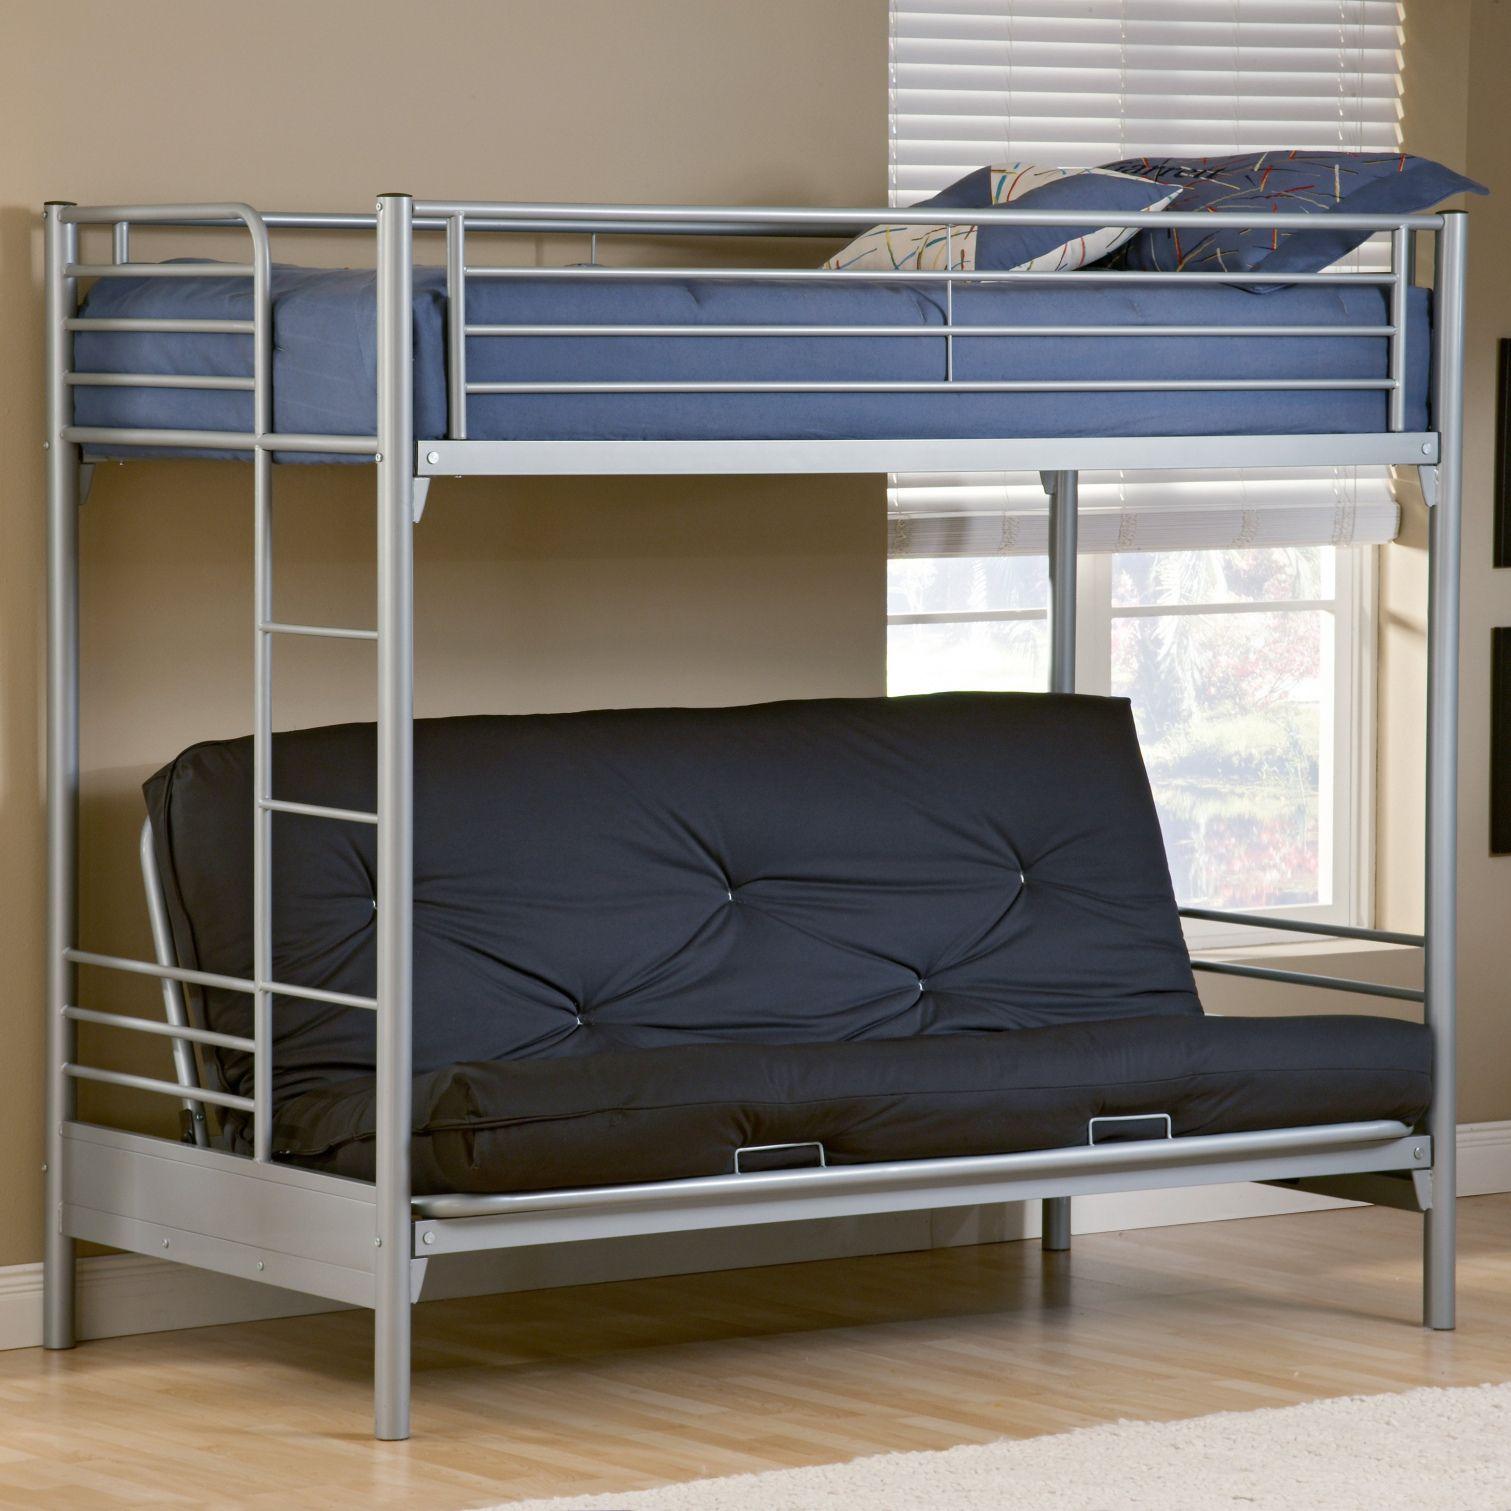 Metal Bunk Bed Futon Combo Interior Paint Color Schemes Check